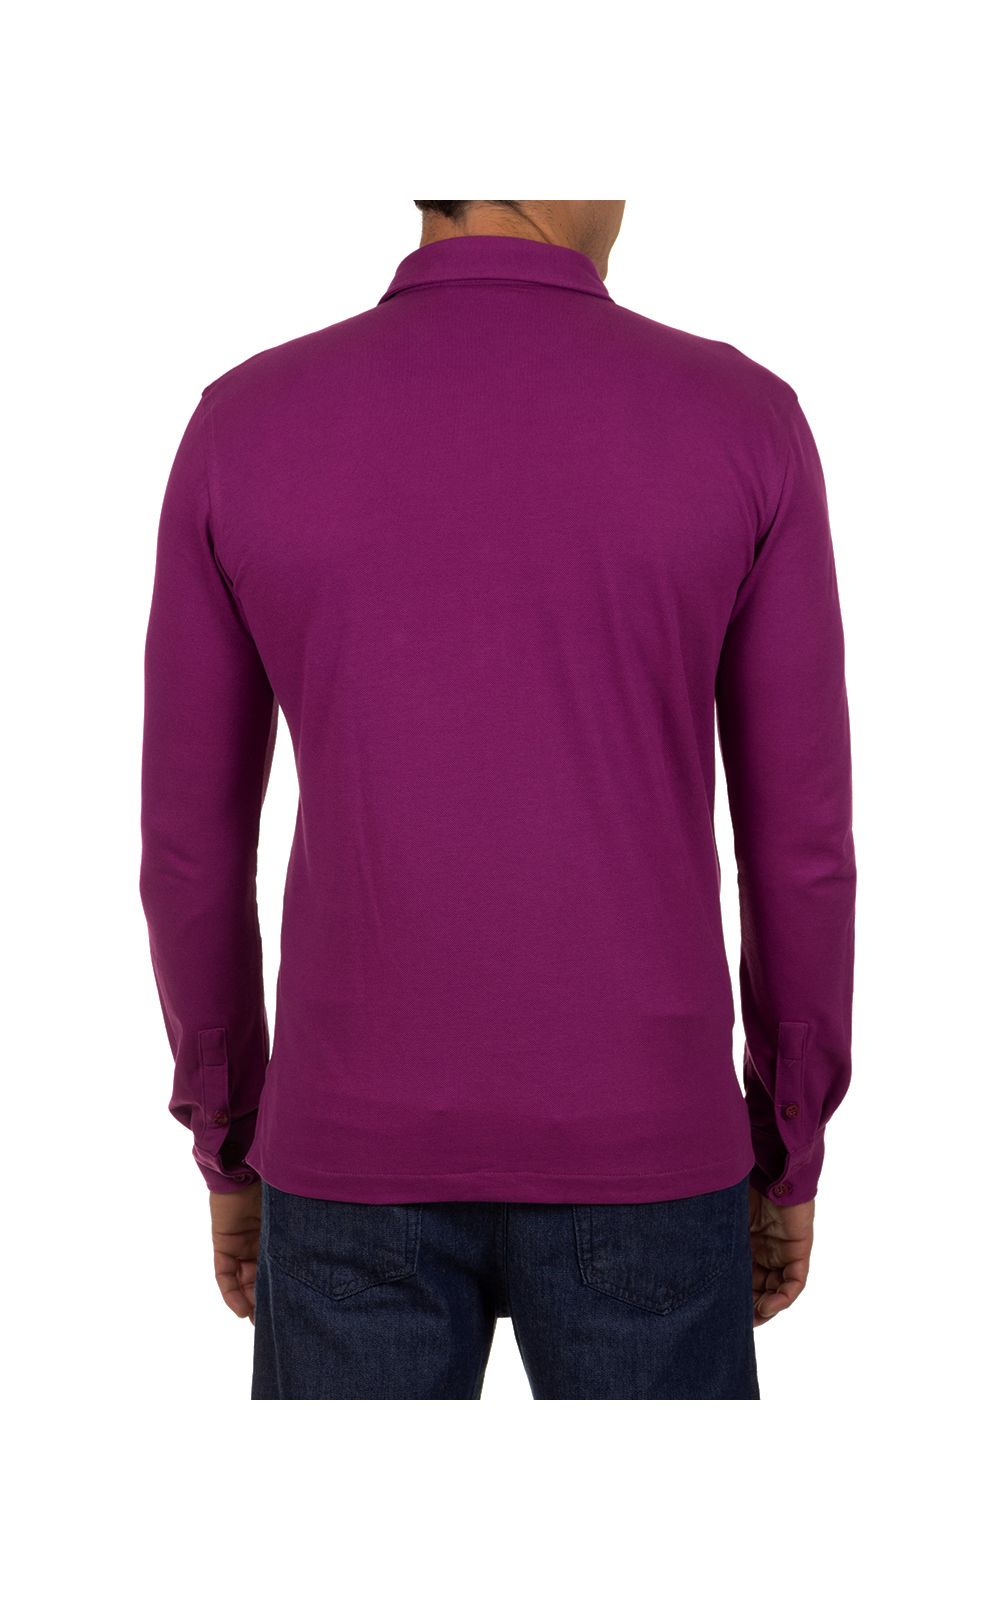 Foto 2 - Camisa Polo Masculina Roxo Lisa